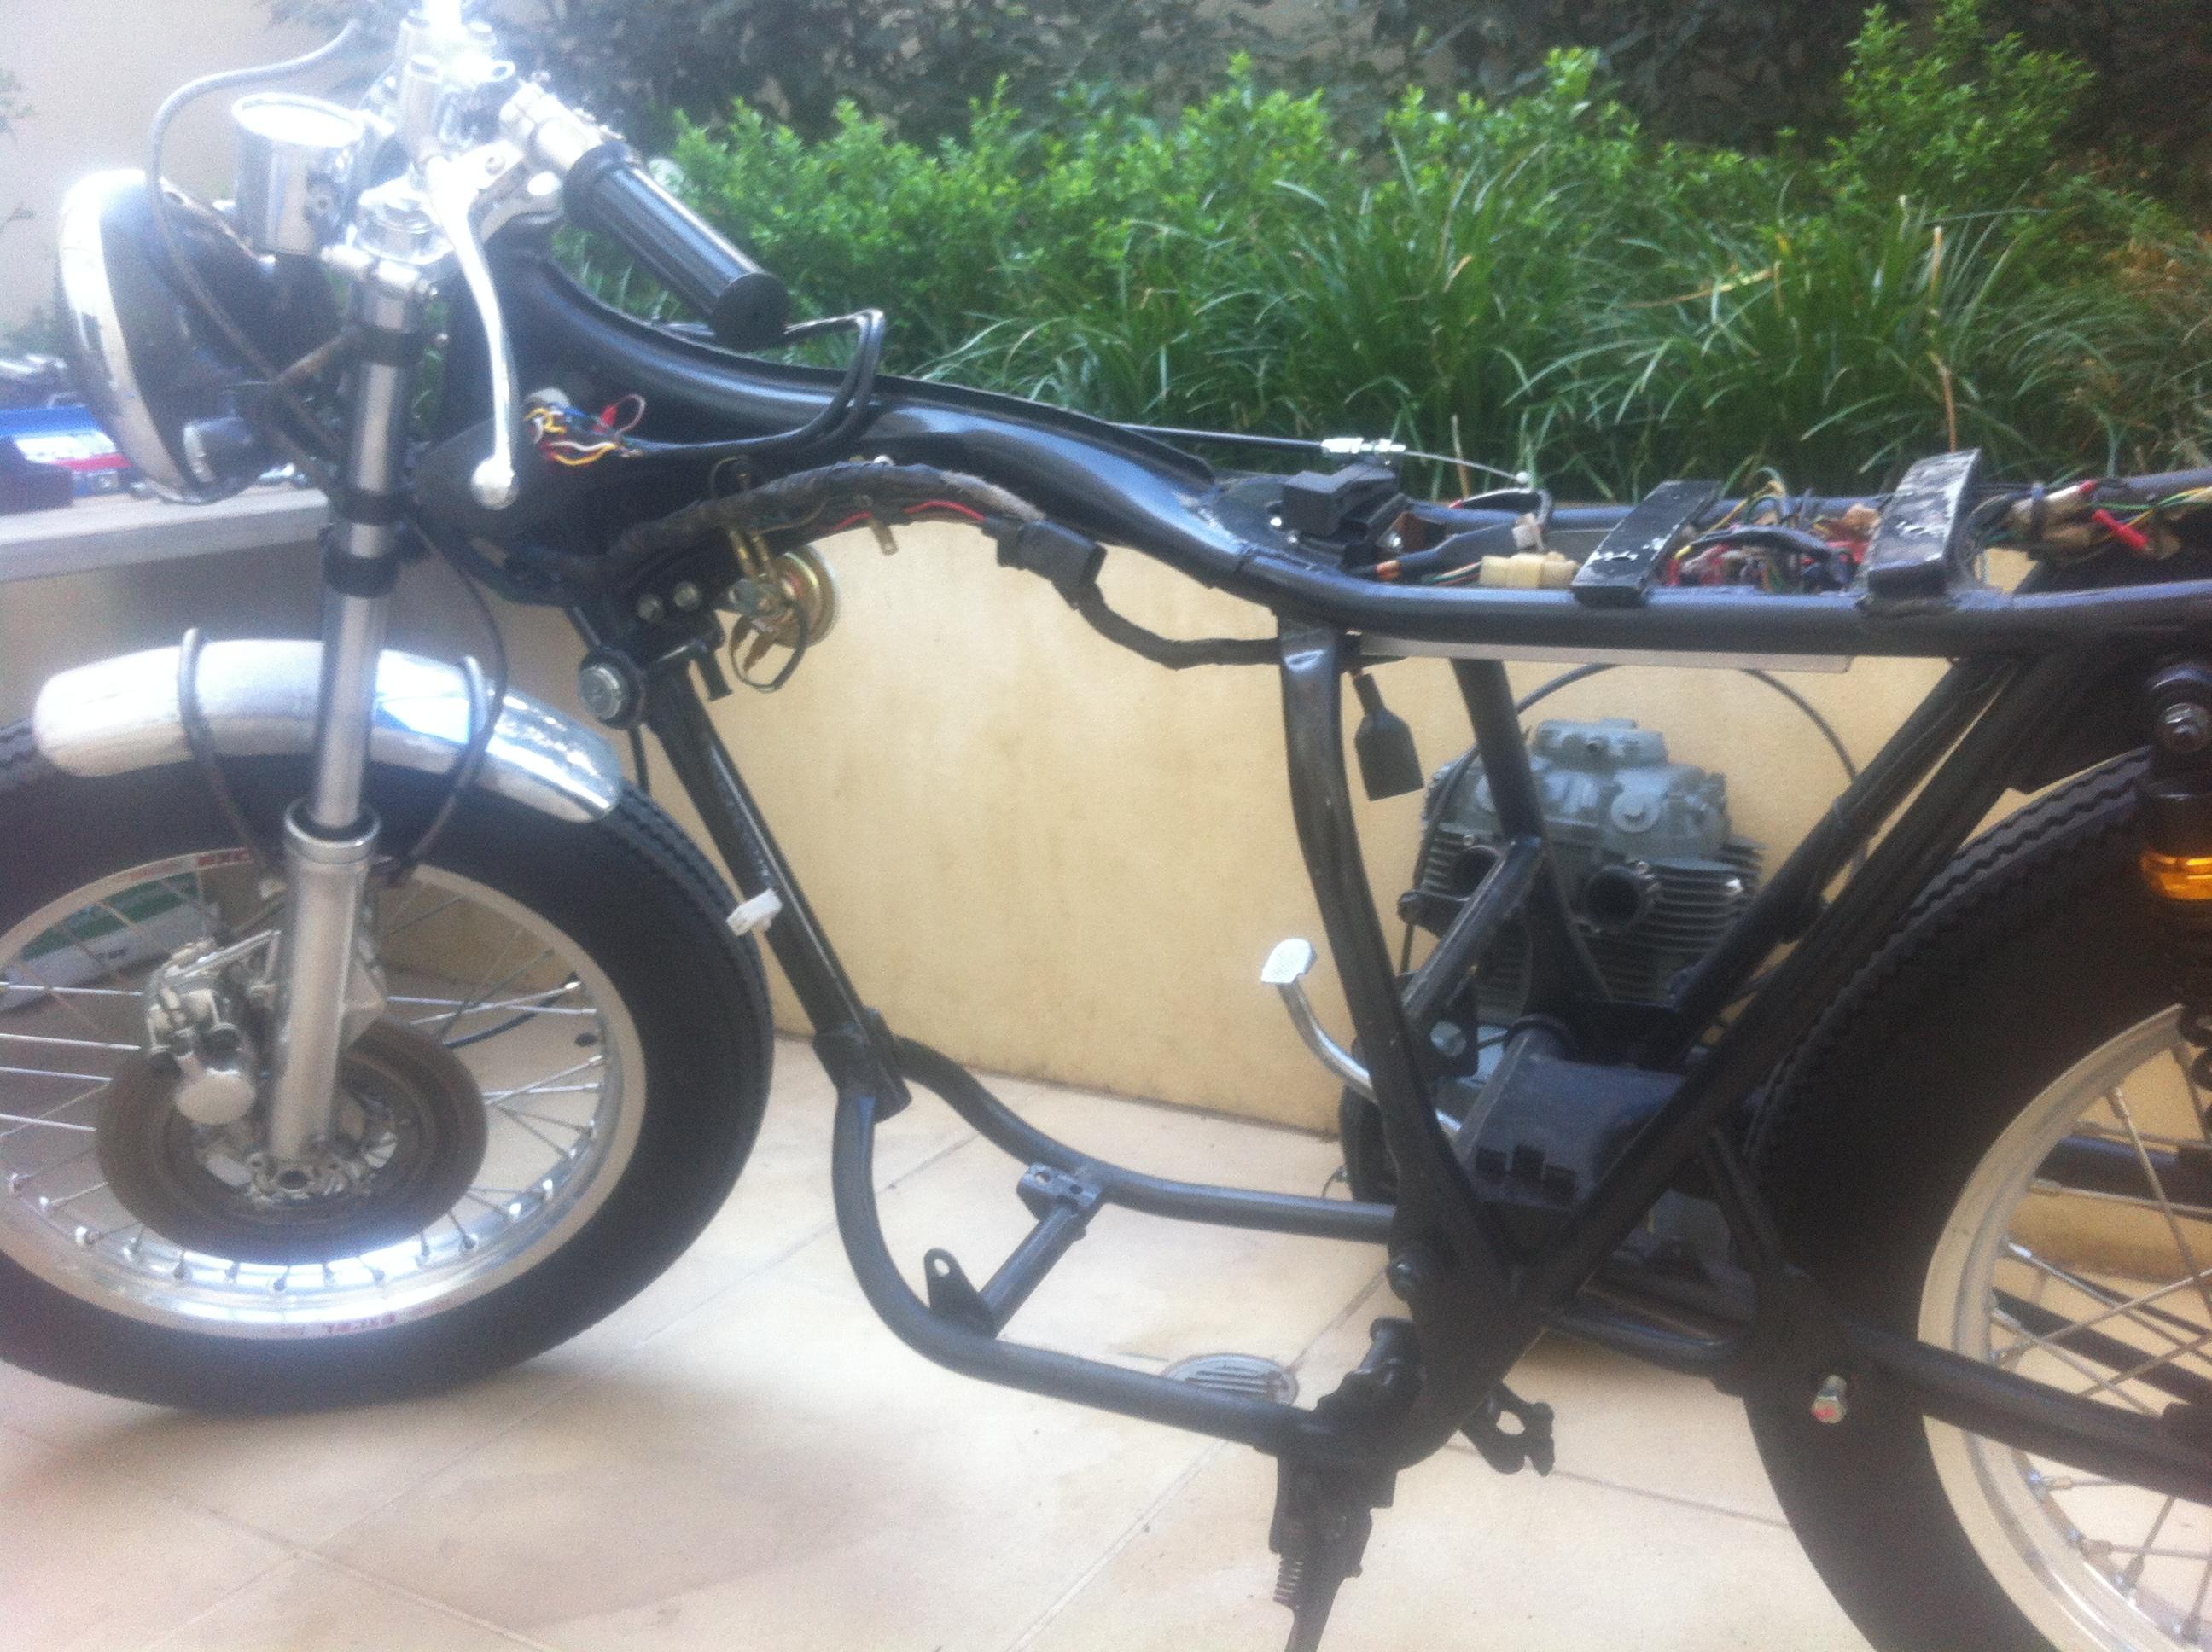 Xr600 Bare Metal CB360 Custom Tracker Brat Cb No